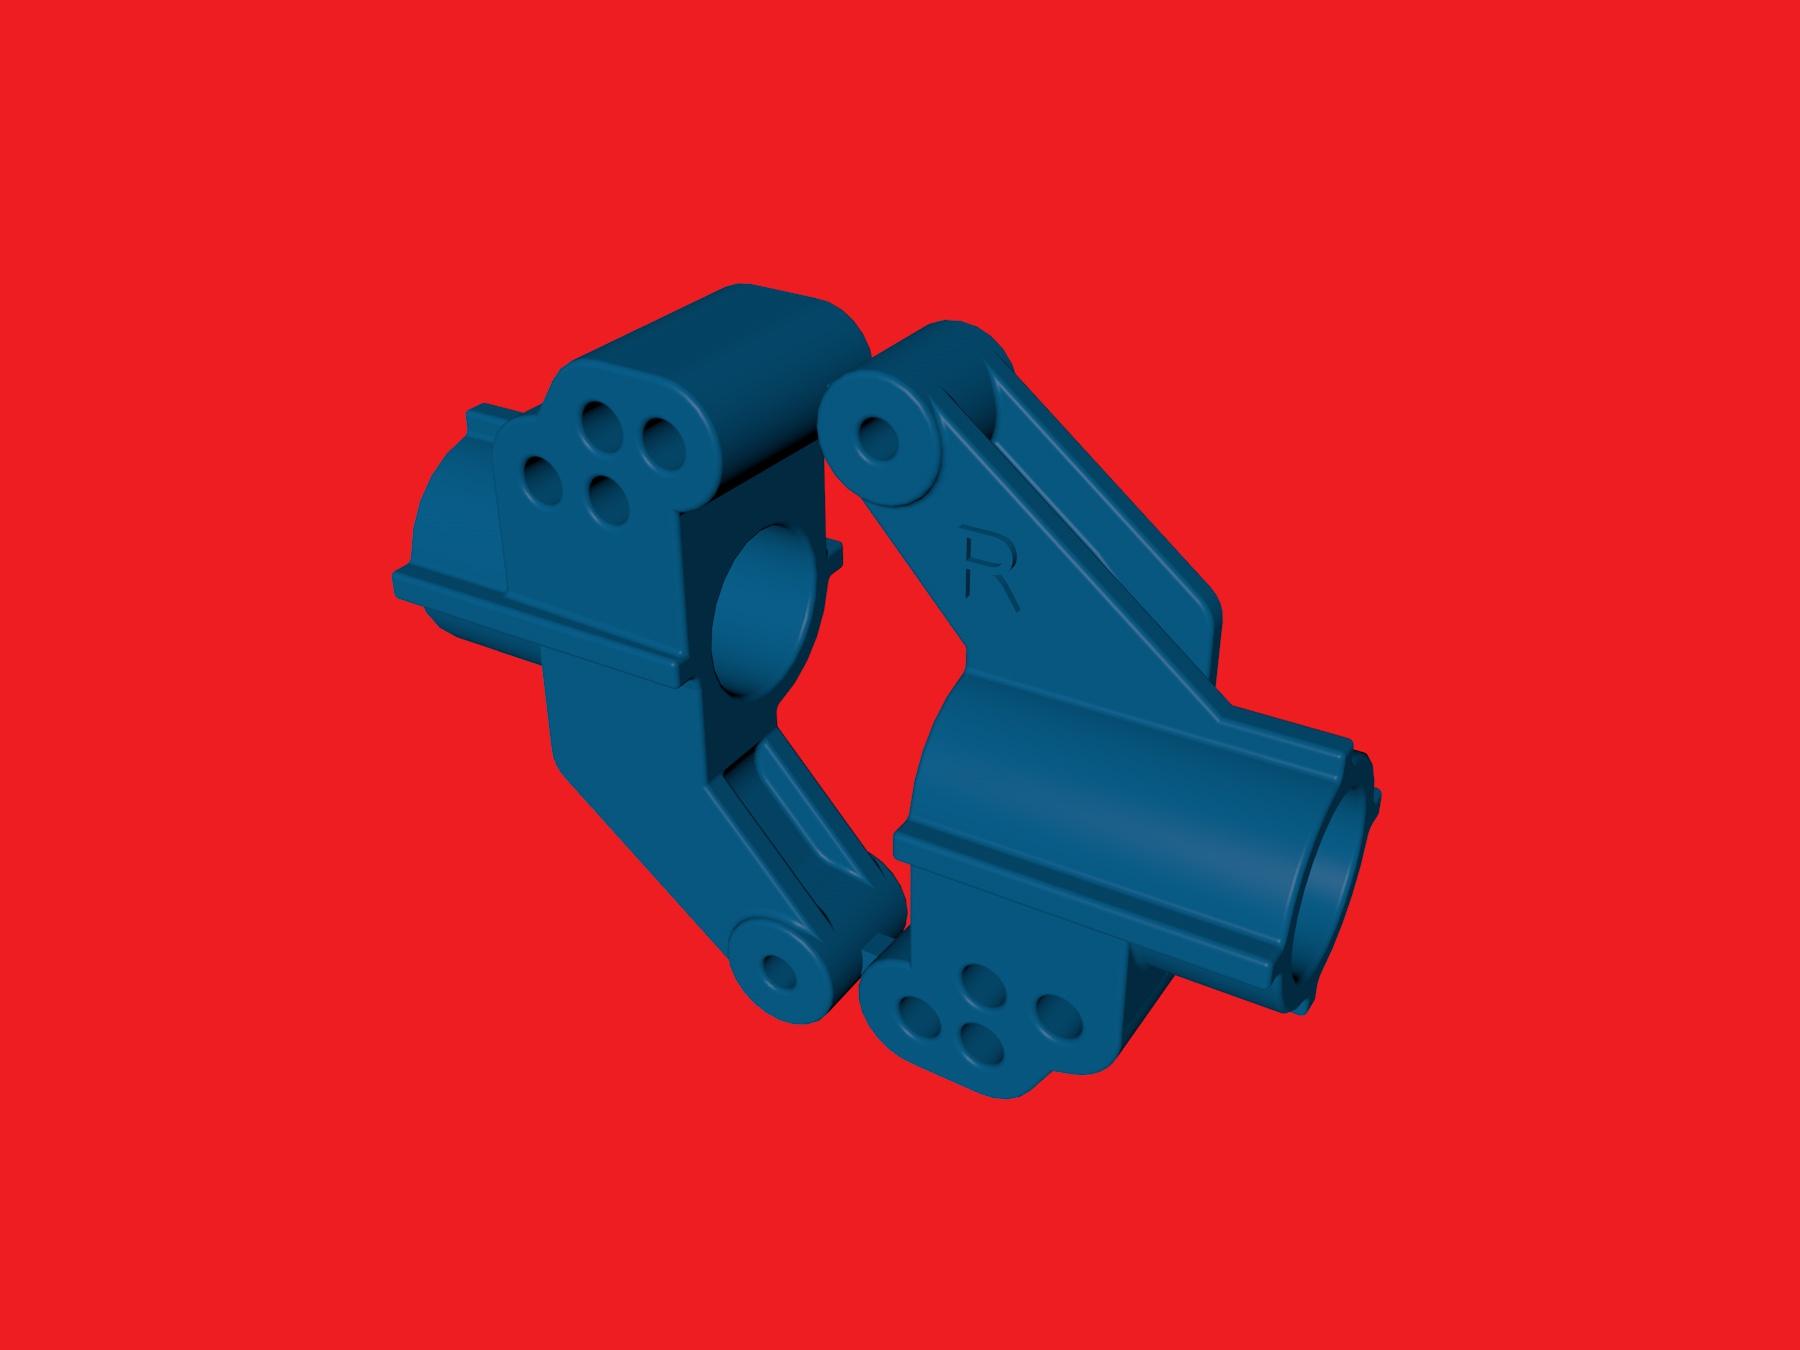 tamiya wrenchdog dyna storm dyna blaster tr-15t c1 c2 rear hub 2deg